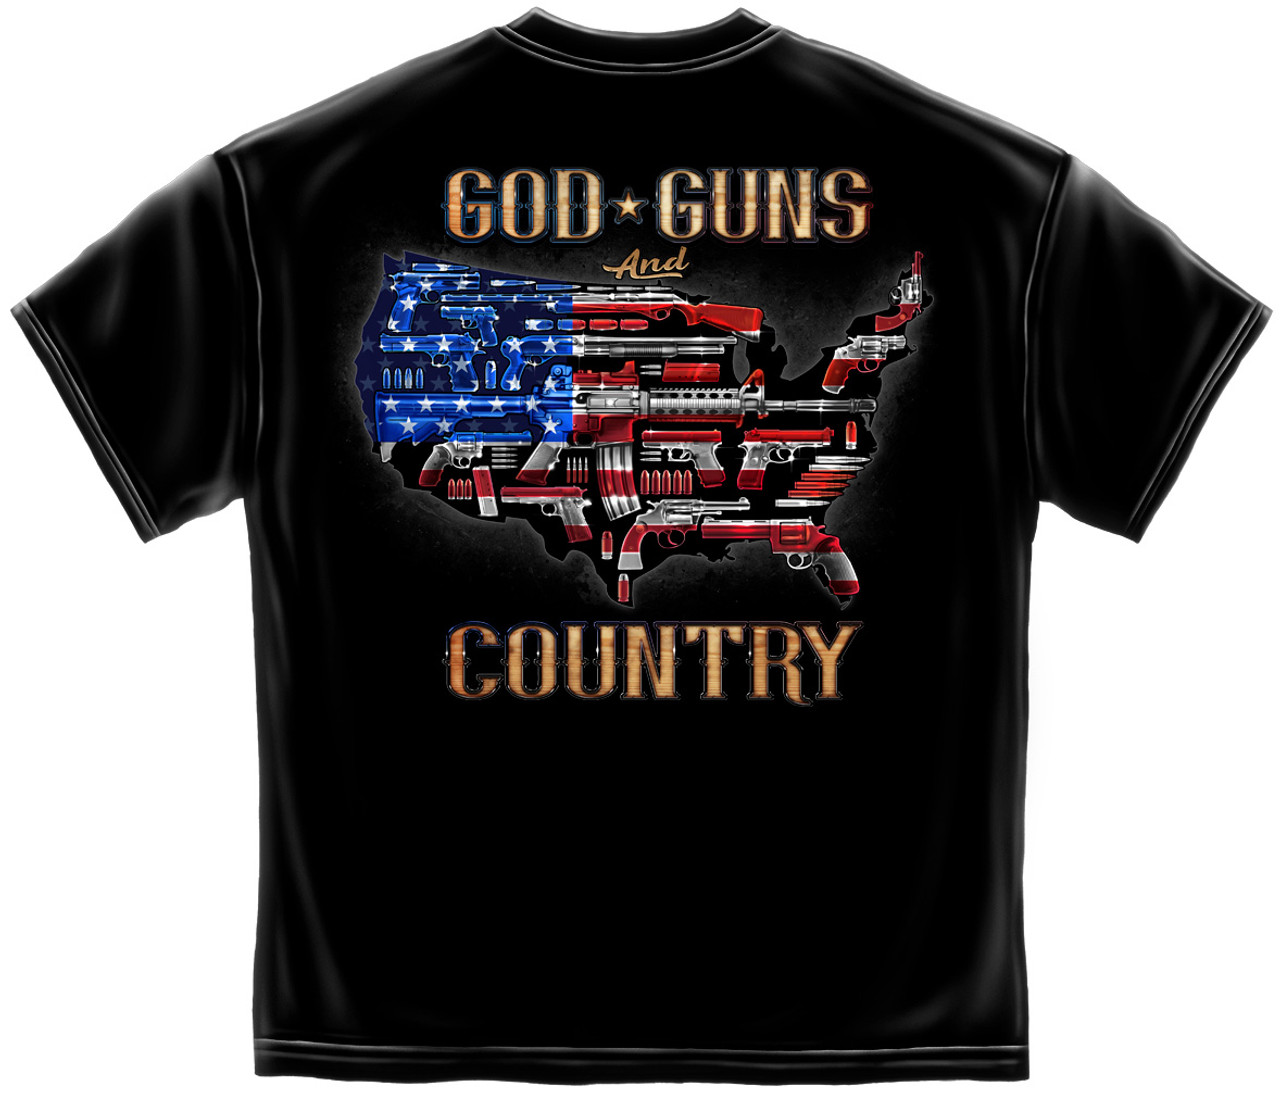 **(OFFICIAL-2ND-AMENDMENT>GOD,GUNS & COUNTRY/PATRIOTIC-RED-WHITE & BLUE-U.S.A. & GUNS,NICE-CUSTOM-3D-GRAPHIC-PRINTED,DOUBLE-SIDED-PRINT-PREMIUM-N.R.A.TEES)**